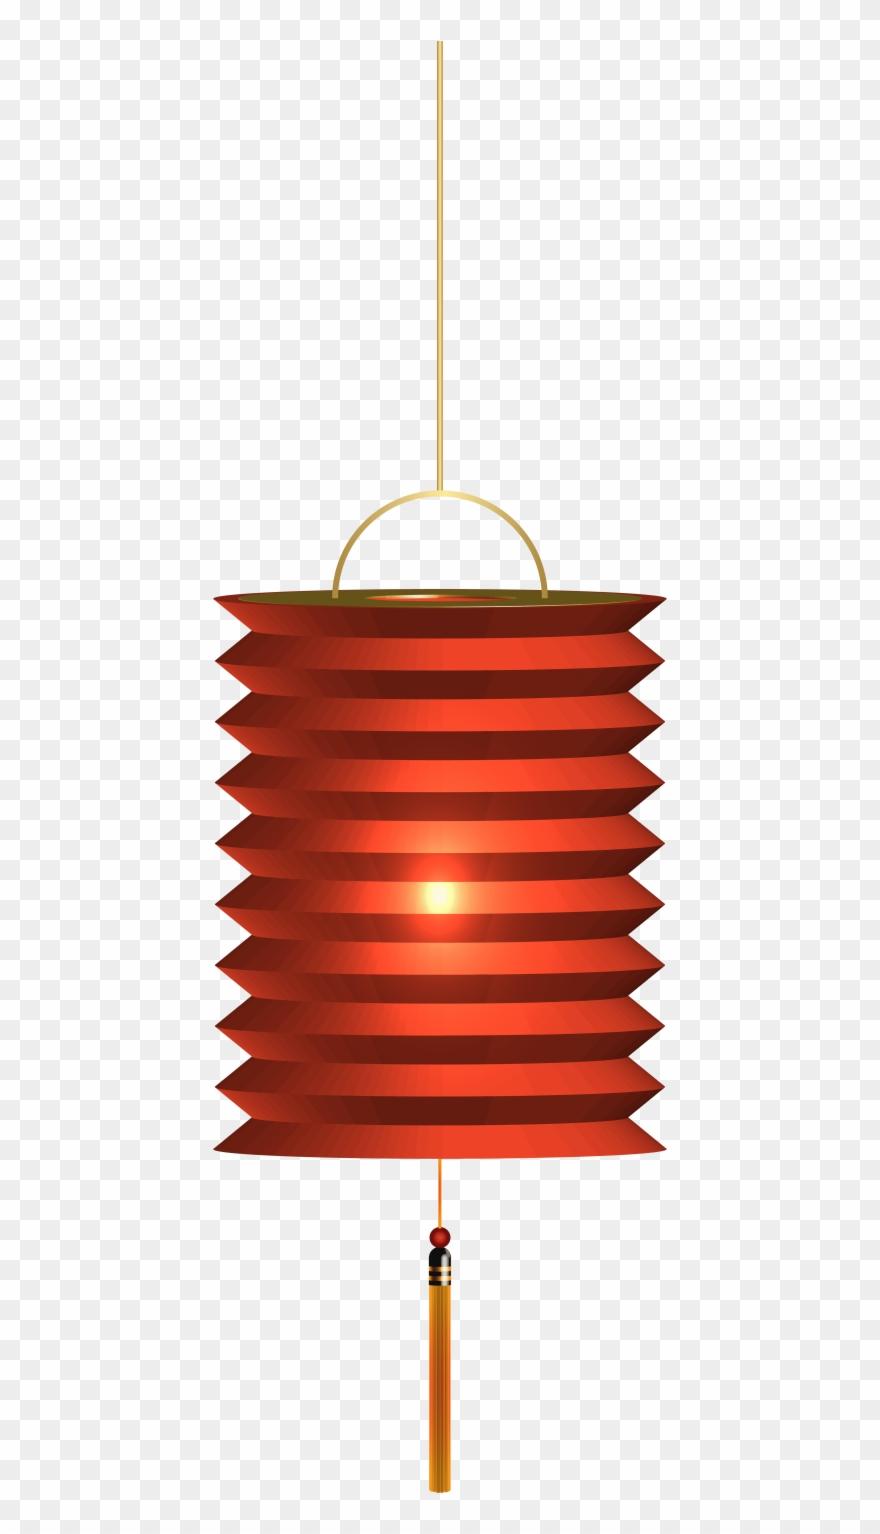 Lantern clipart latern. Fan orange chinese transparent